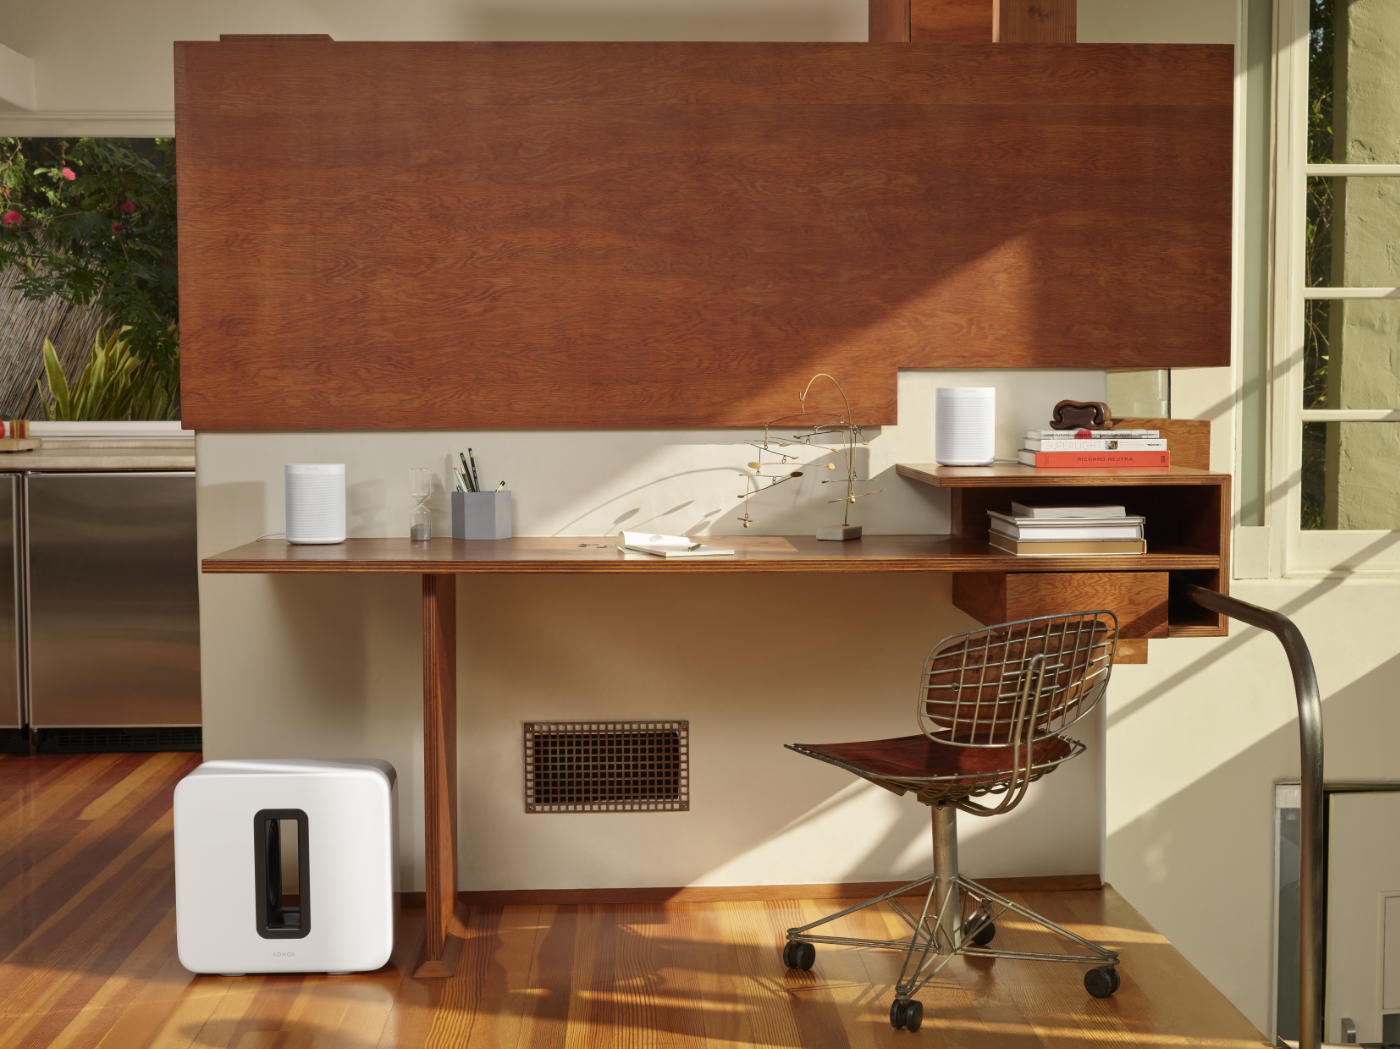 Sub_White-Lifestyle-Desk-Q2FY20_MST-MST_JPEG_fid82094